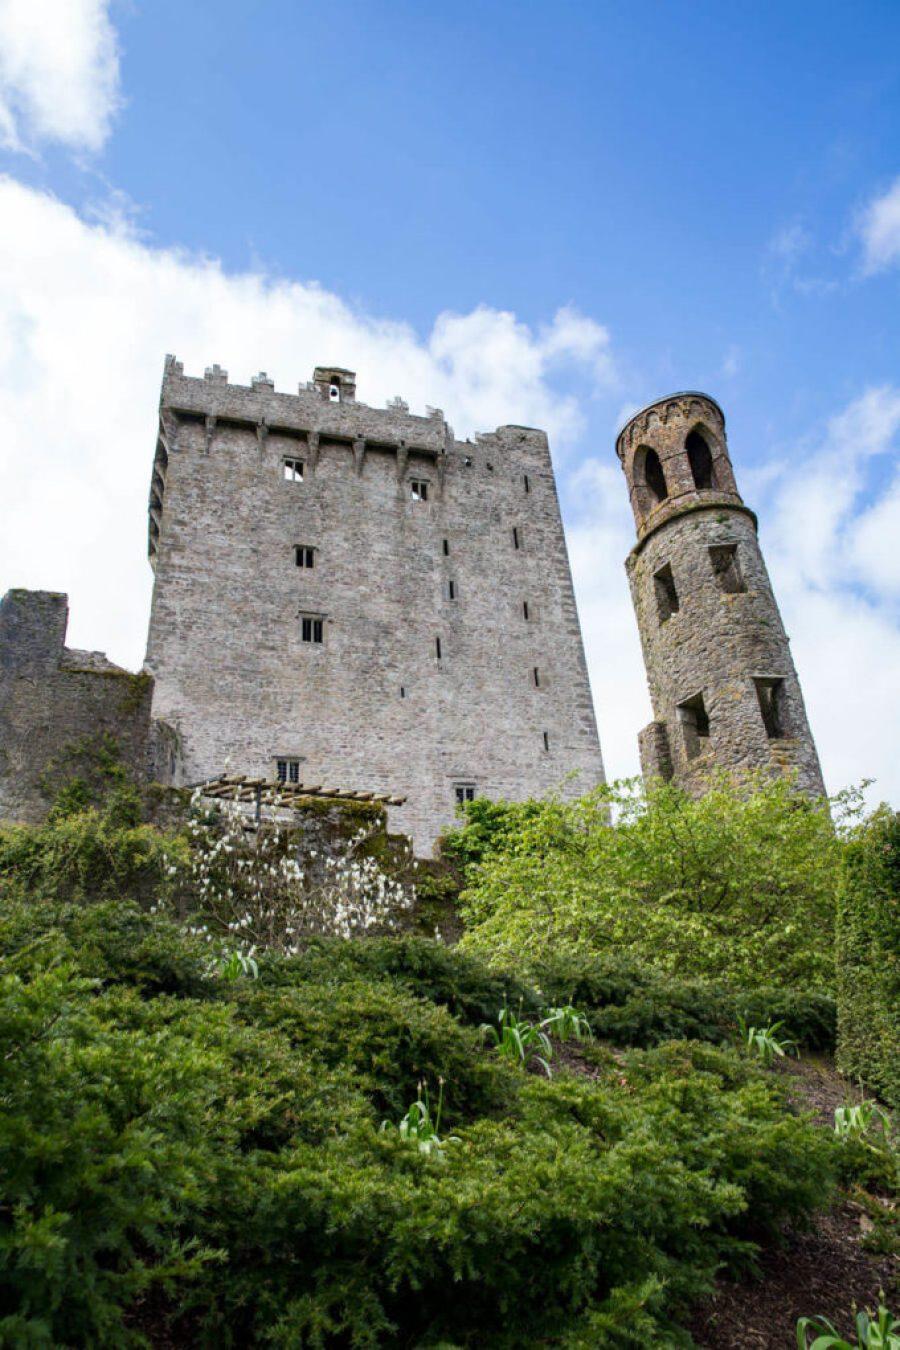 Blarney Castle, the historic, beautiful grounds of Blarney Castle county Cork